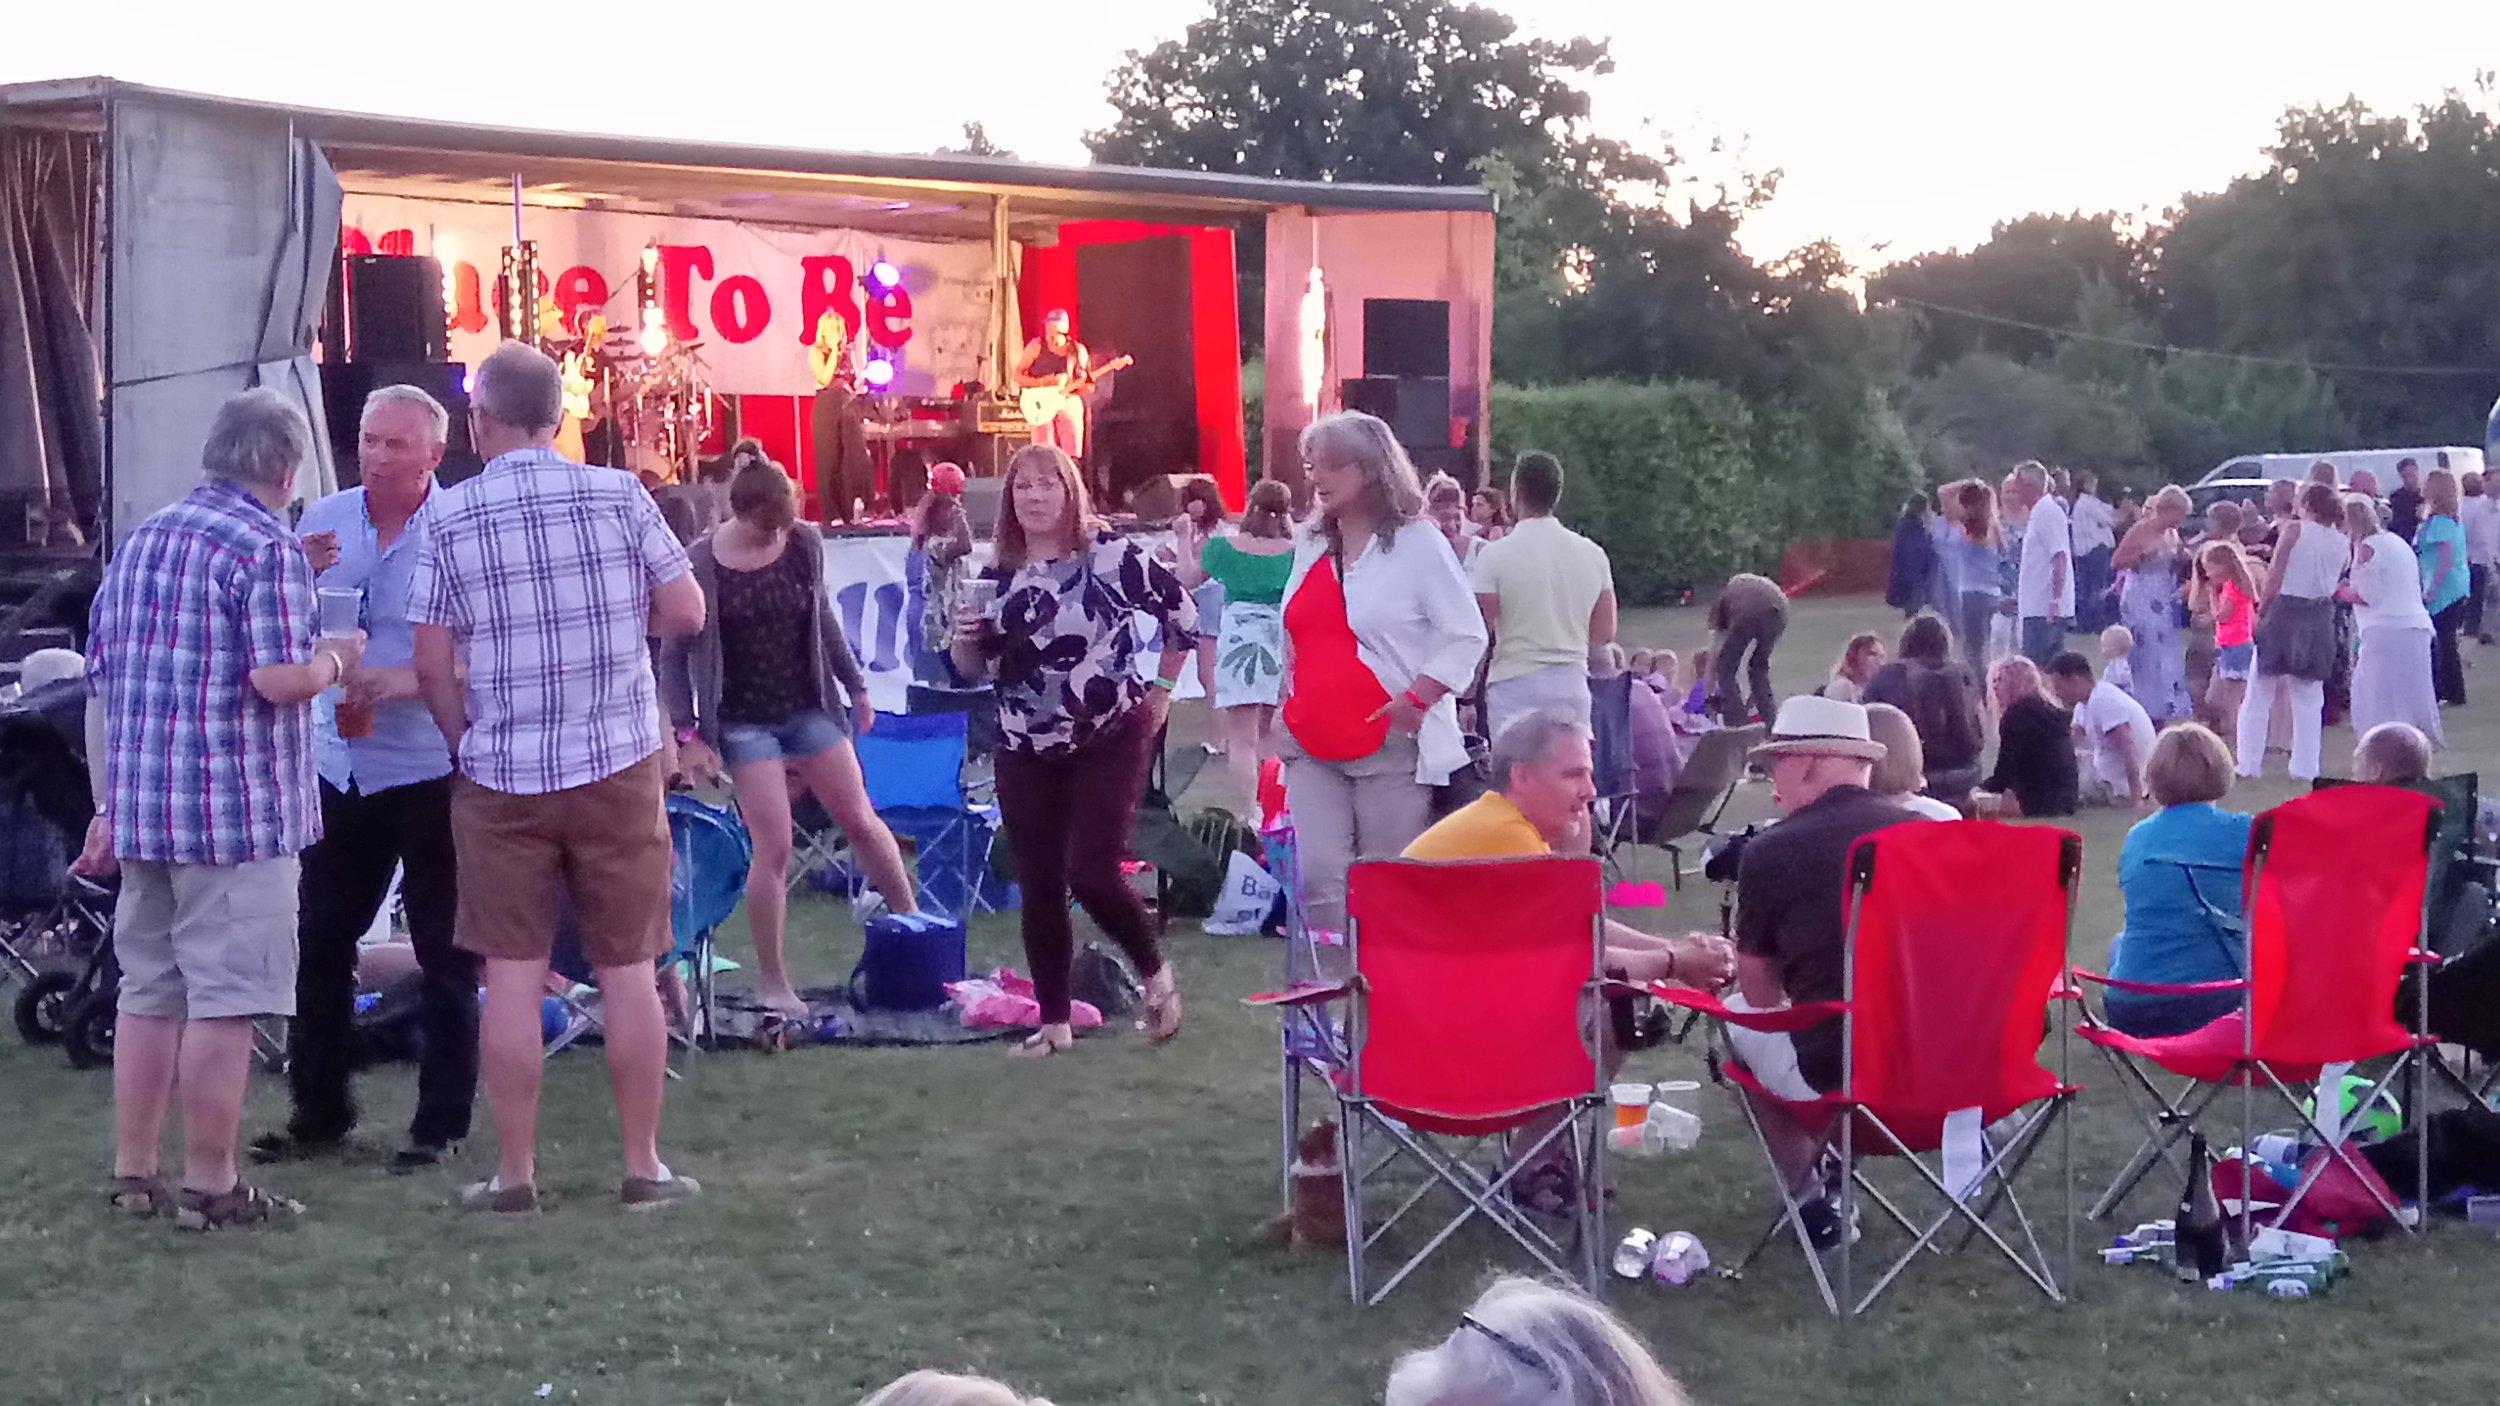 Summer evening enjoyment at Grattonbury